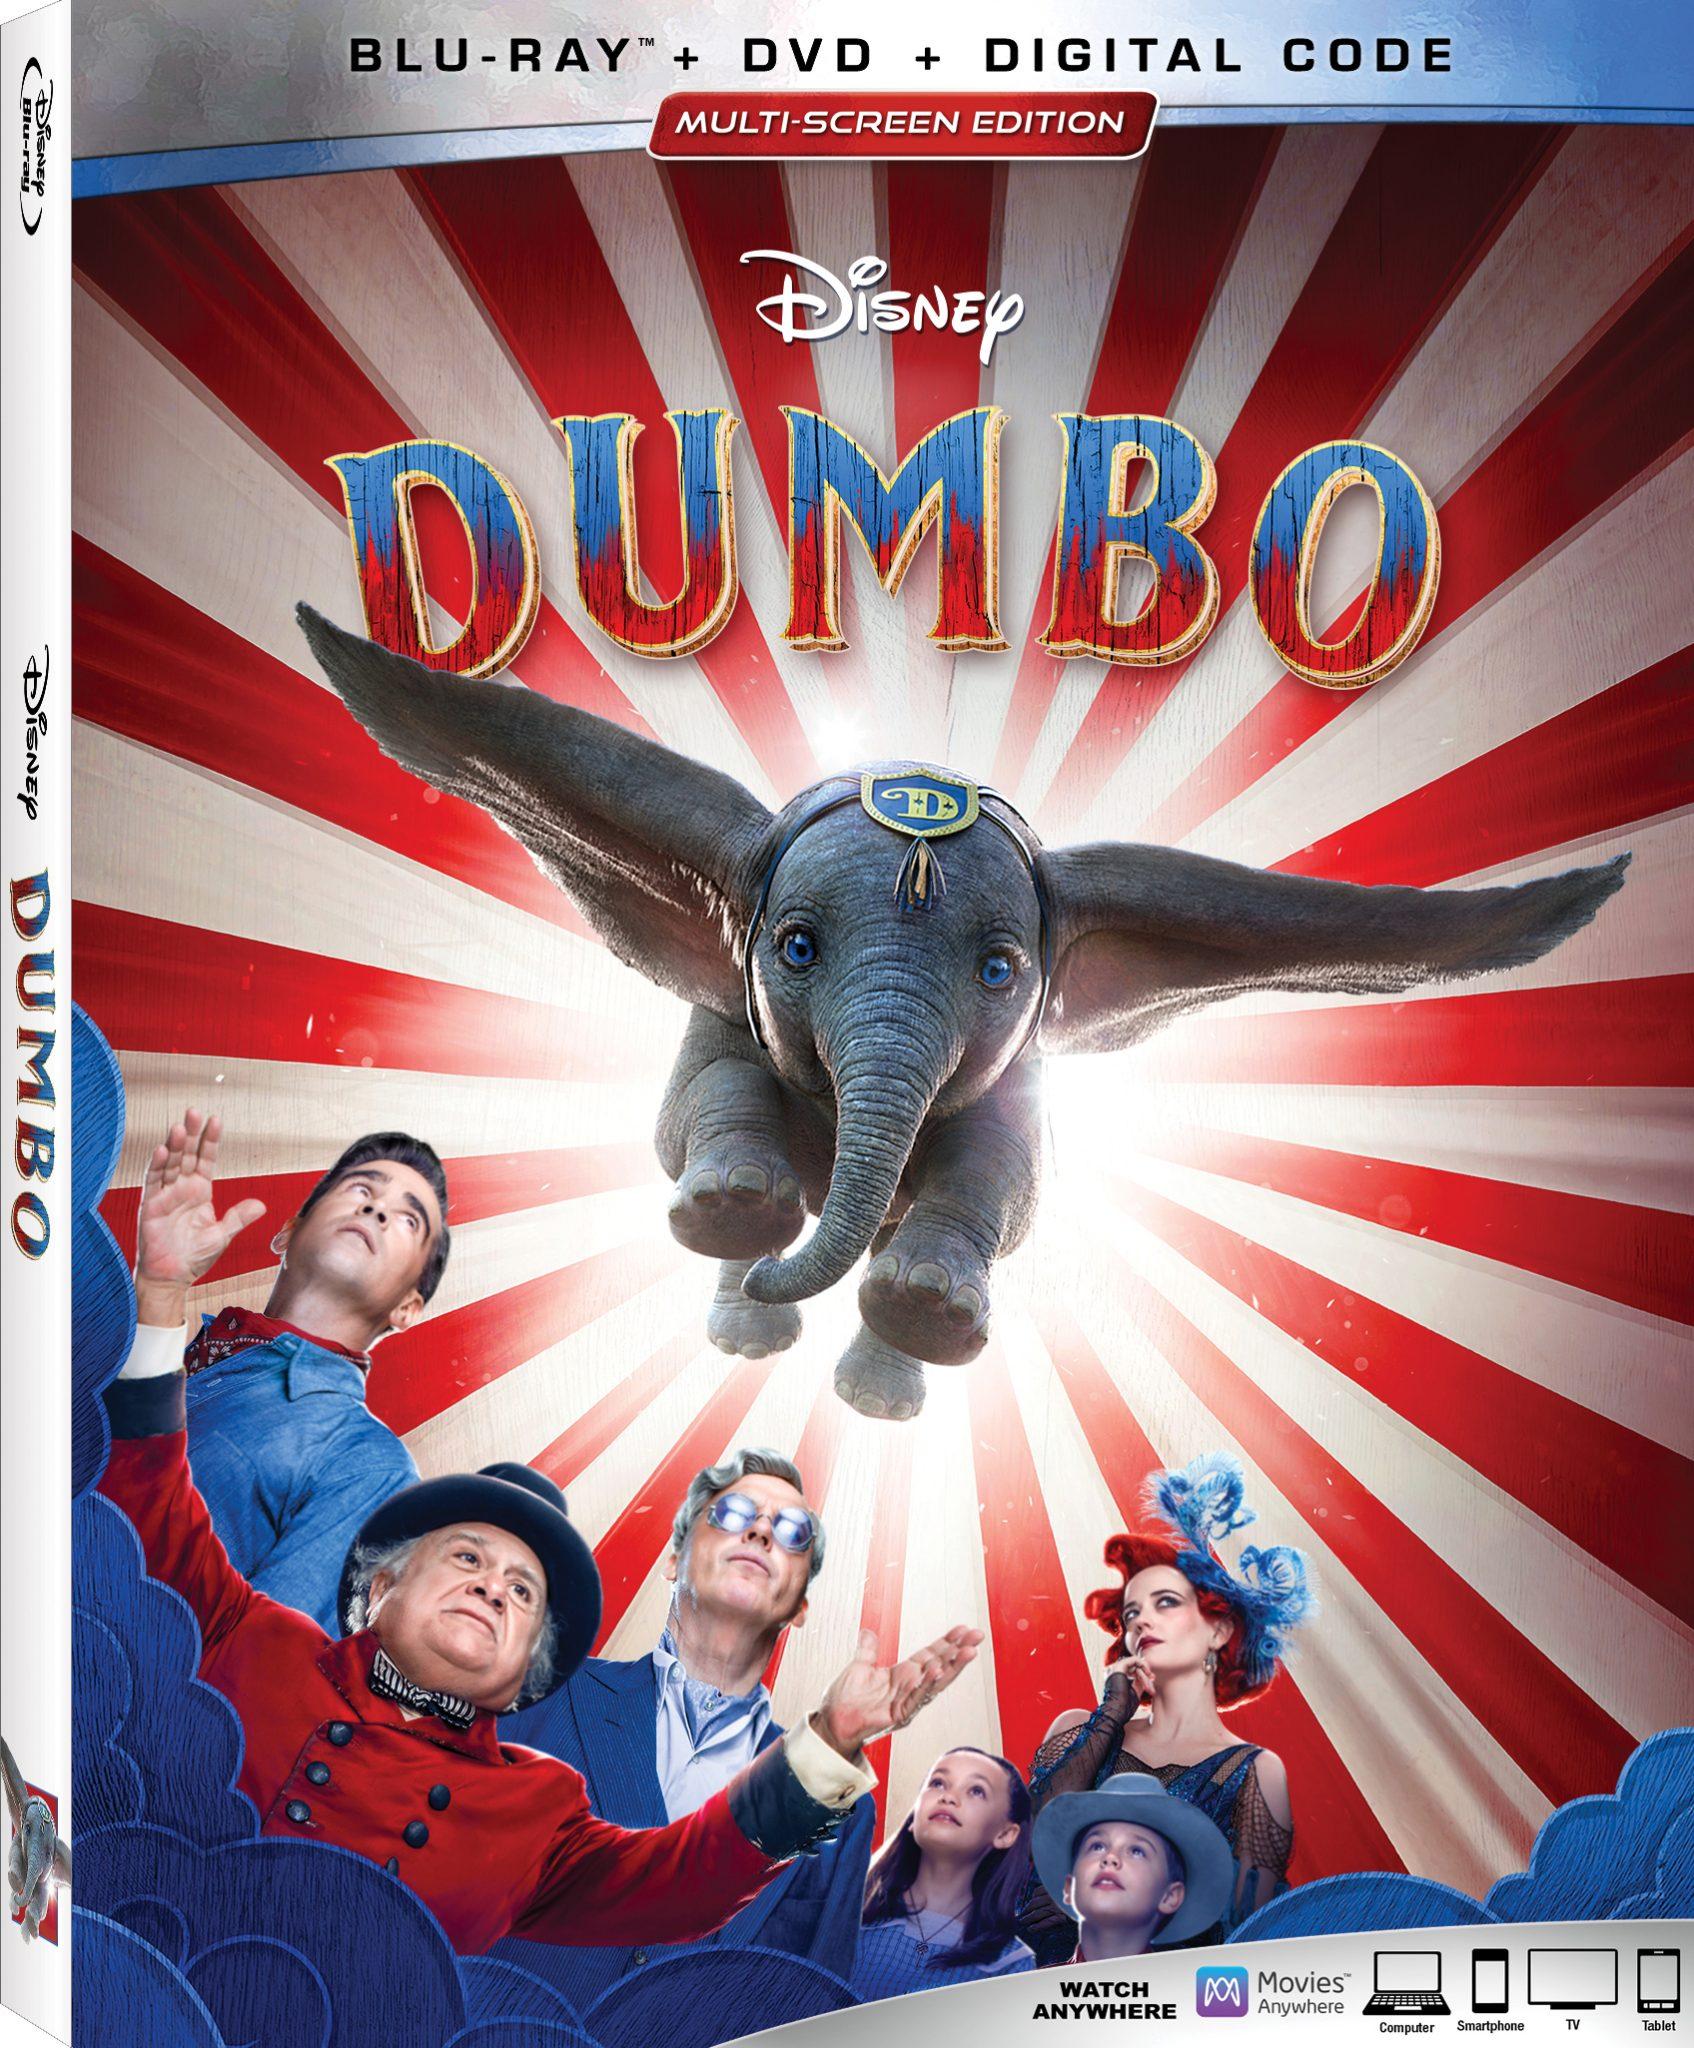 DUMBO is on Blu-ray and Digital TOMORROW 6/24 -Celebrate with Fun Activities! #Dumbo